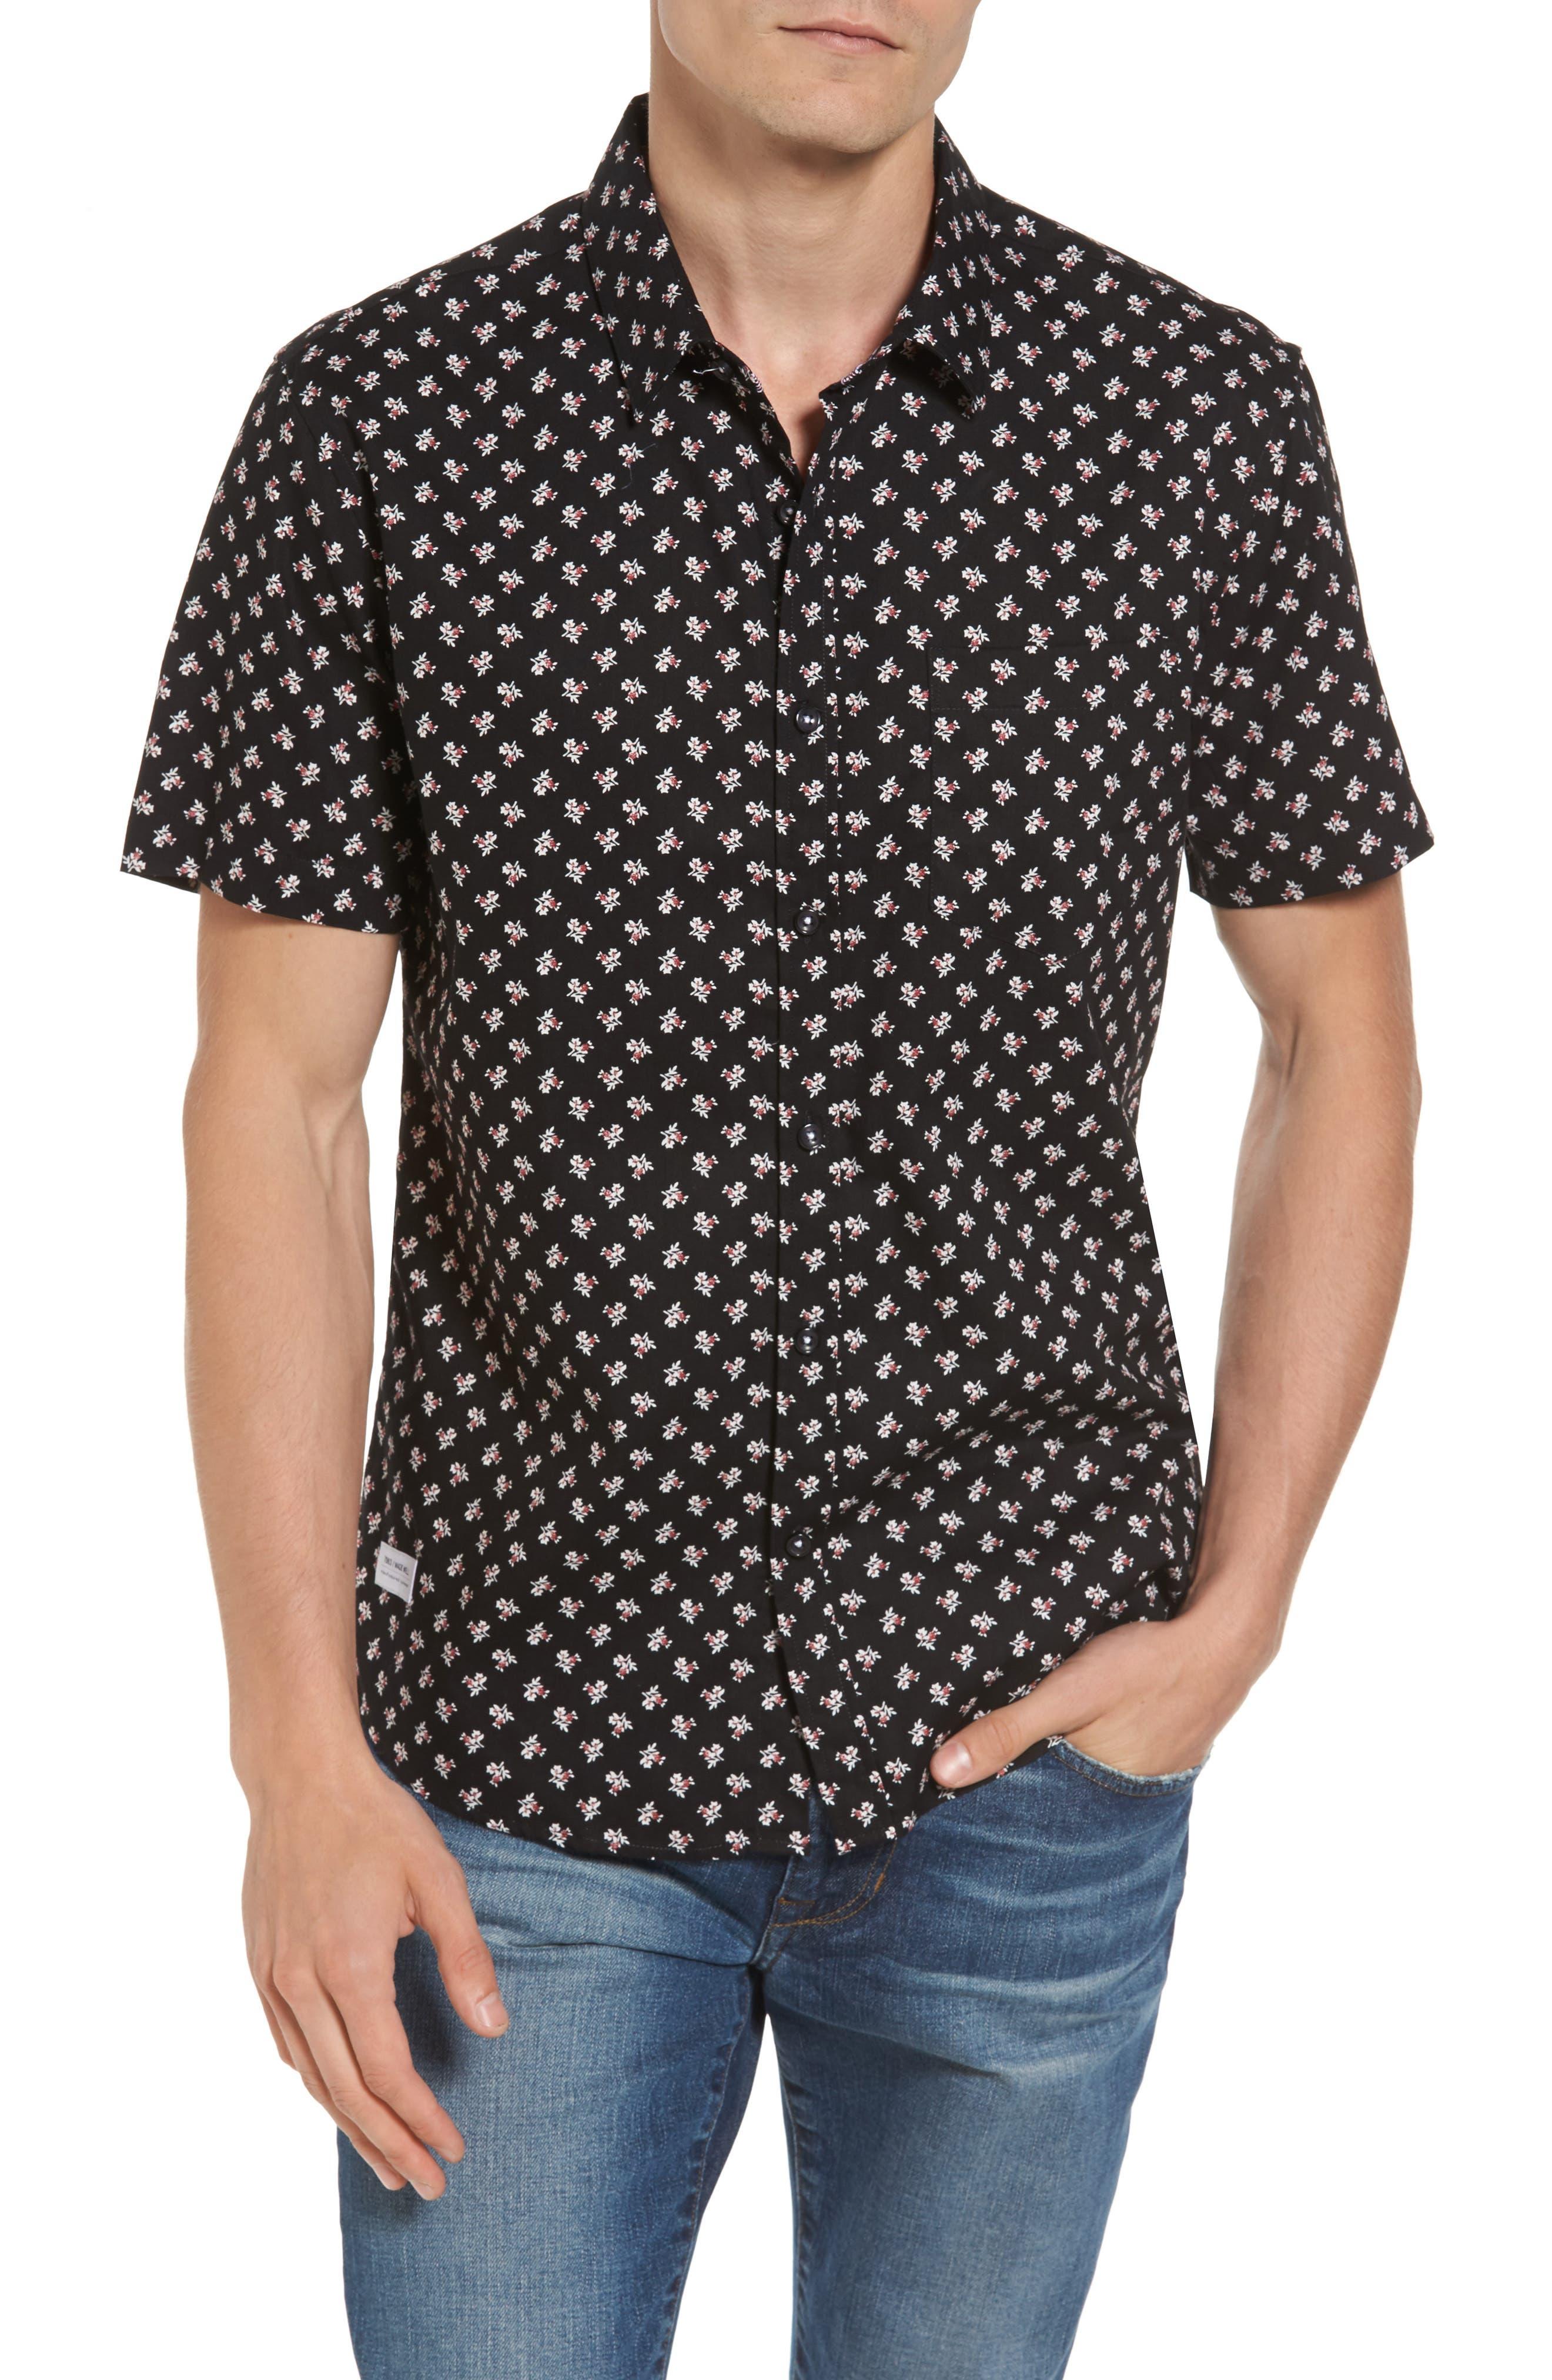 7 Diamonds Shadow Dancing Print Woven Shirt